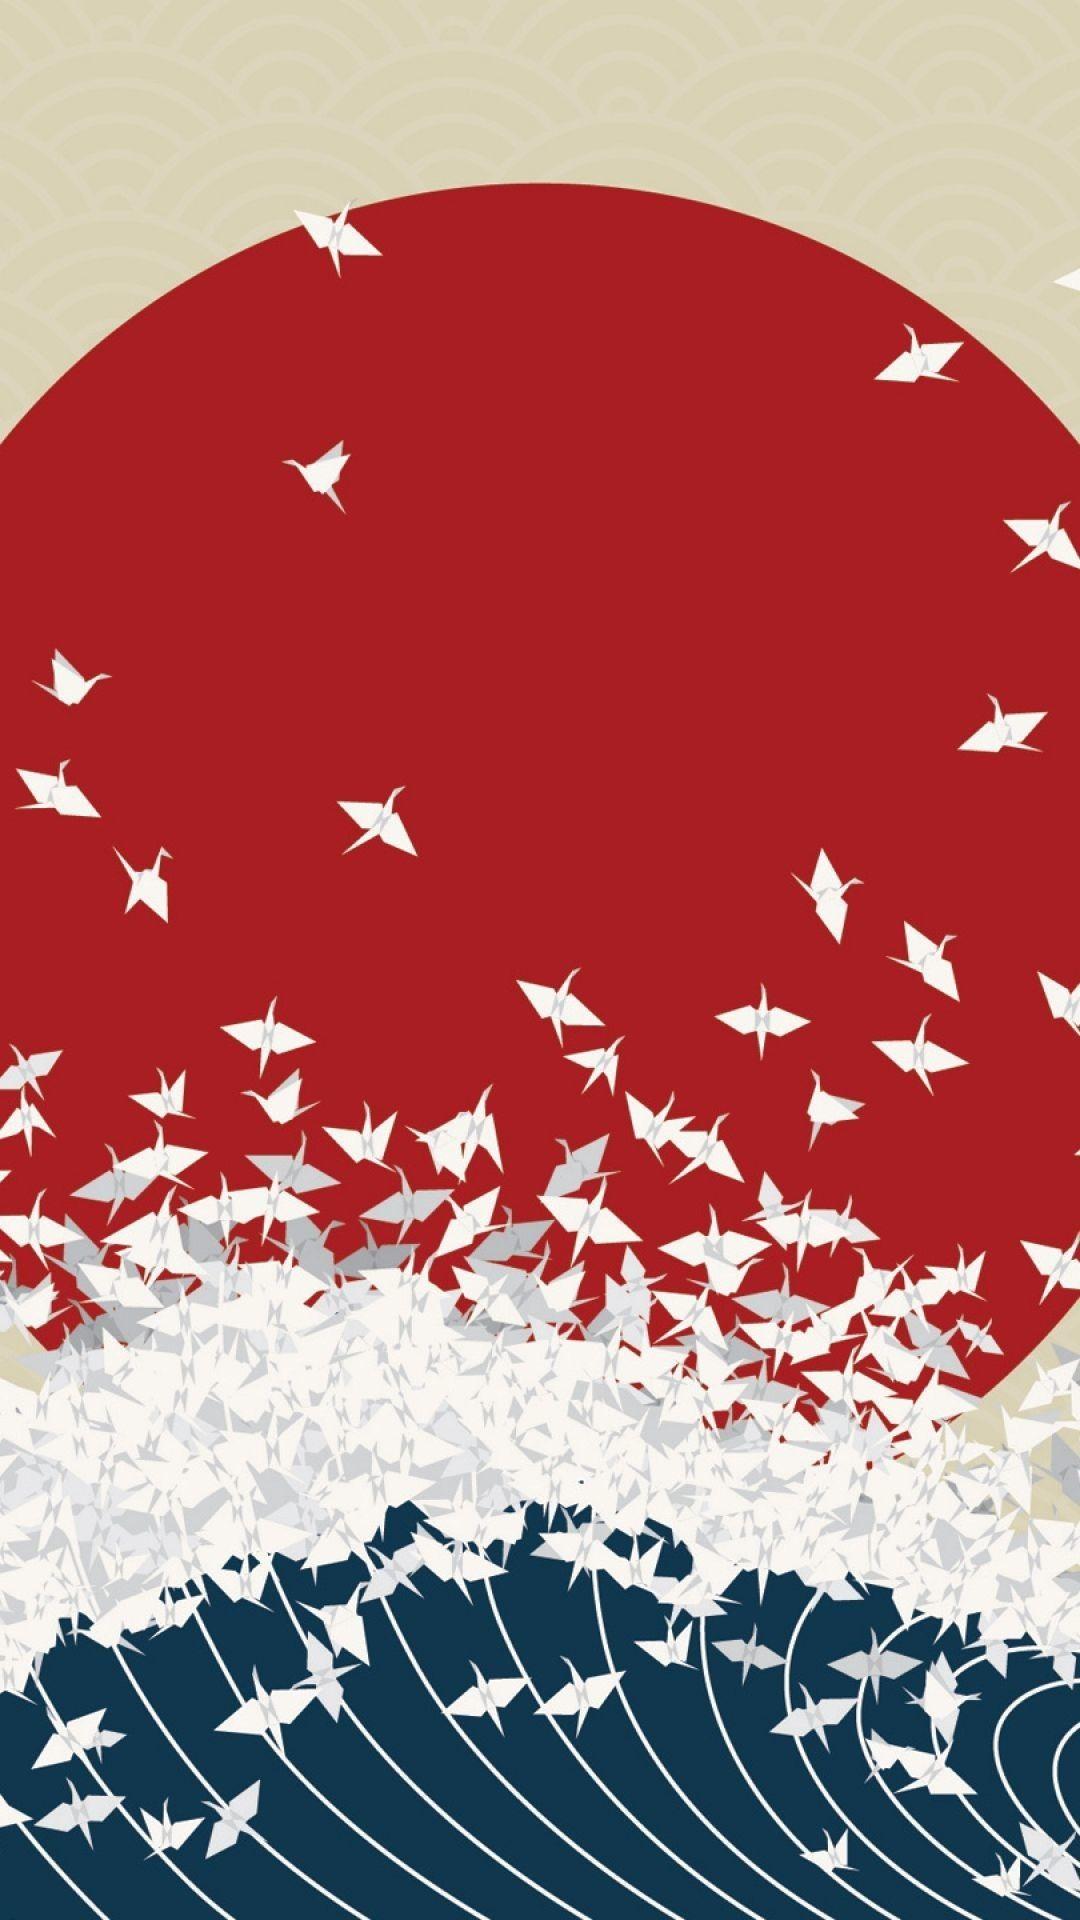 Res 1080x1920, Download Wallpaper minimalism, origami